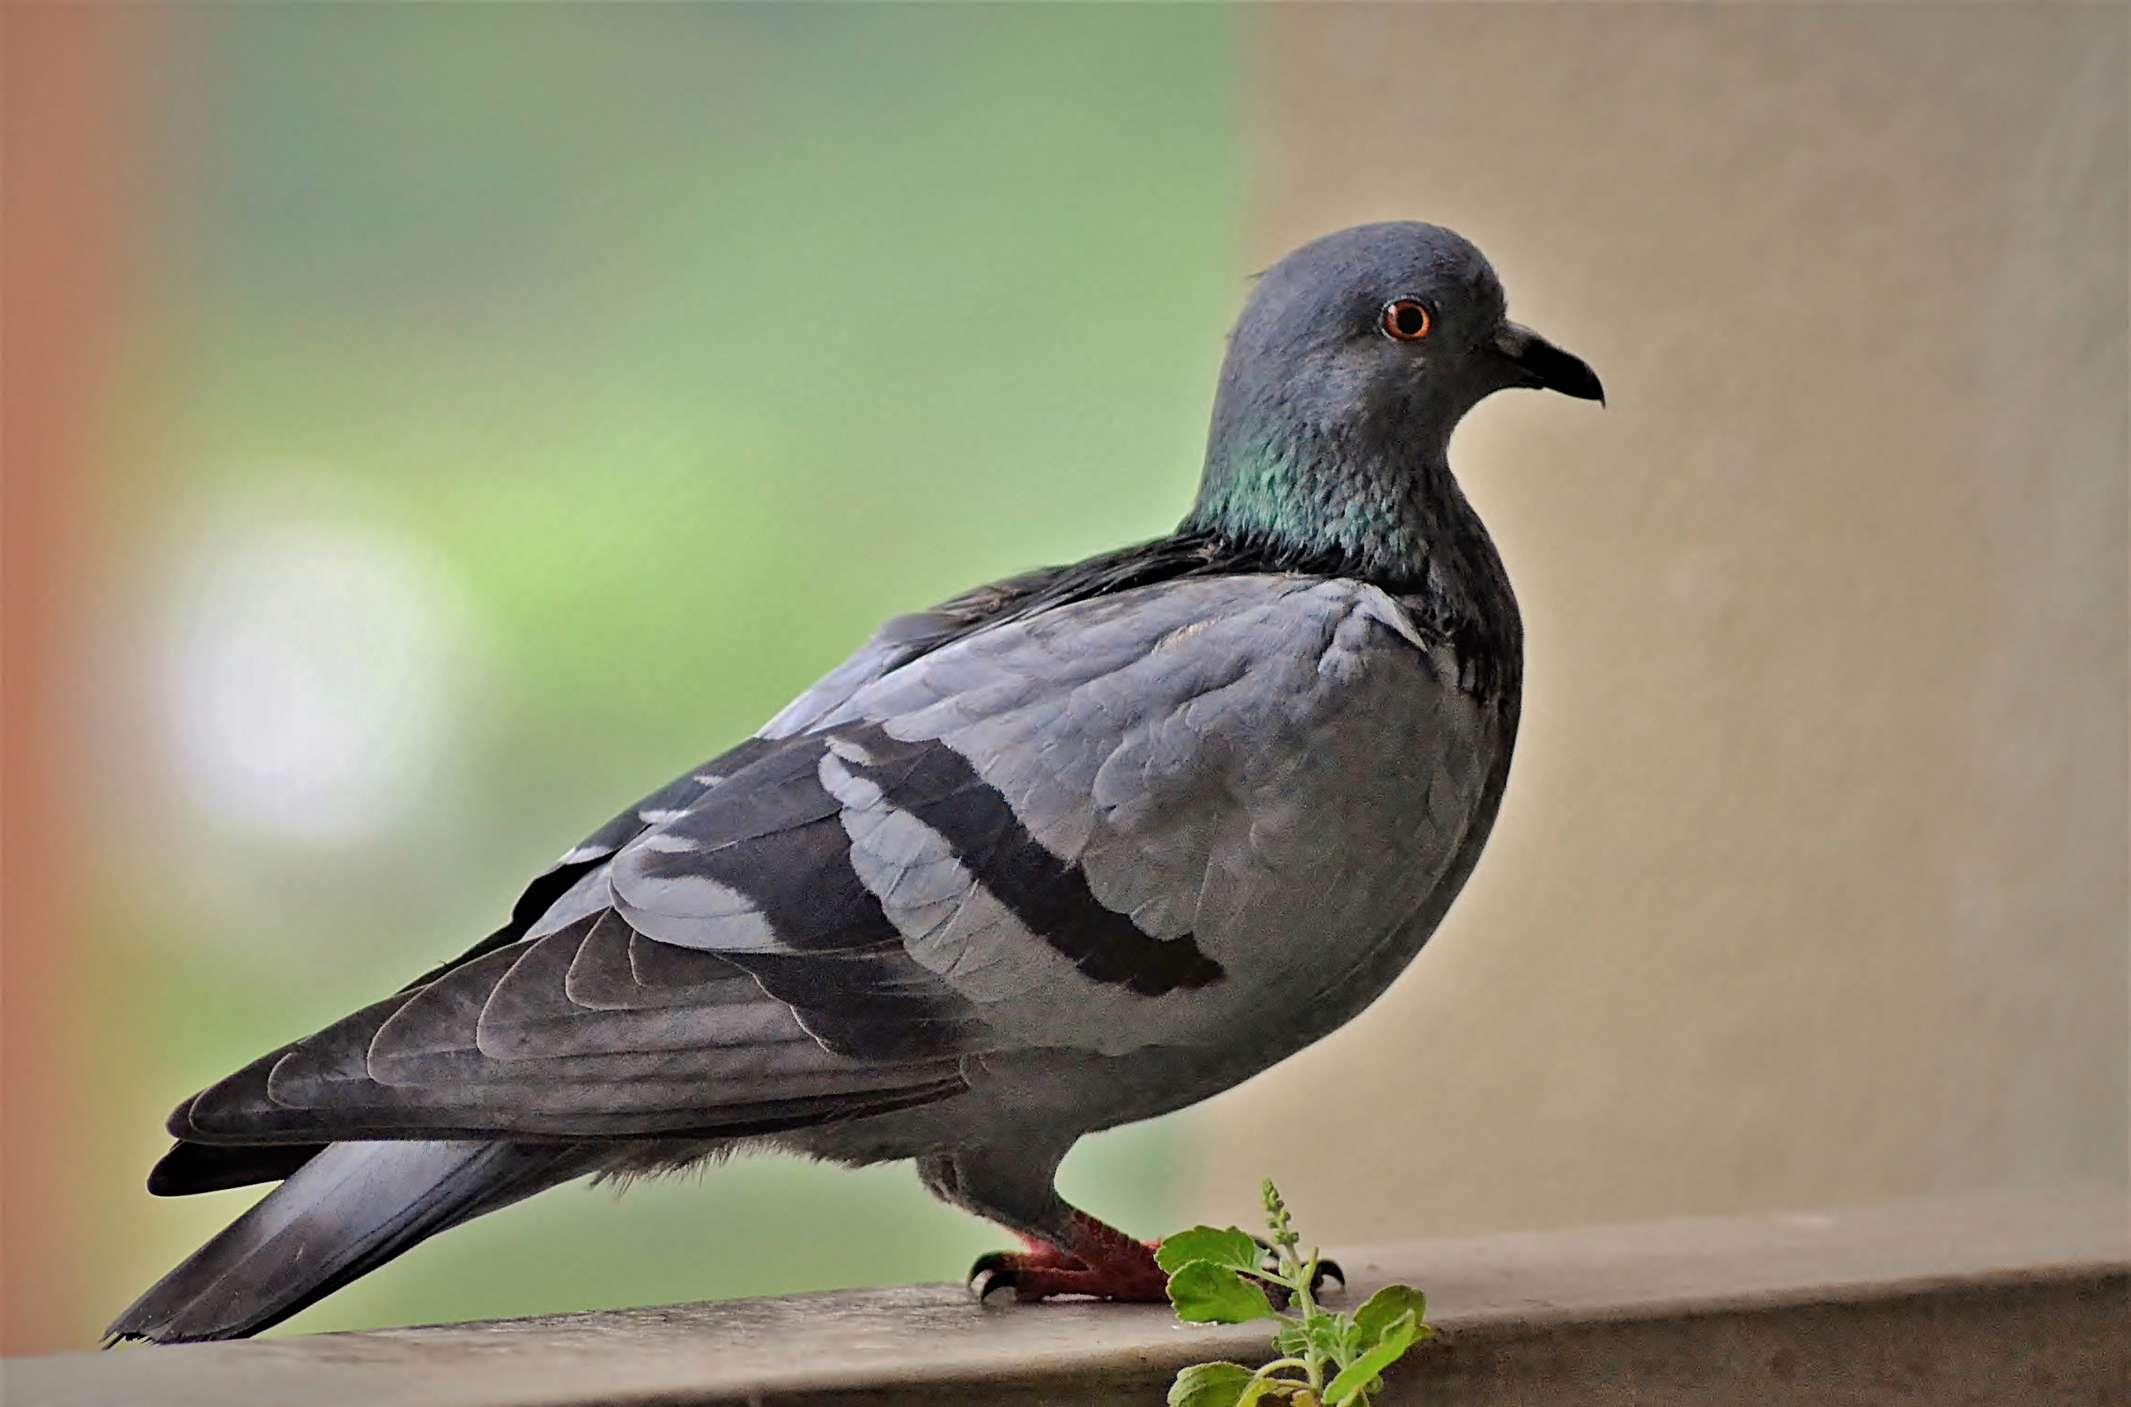 Rock dove perched